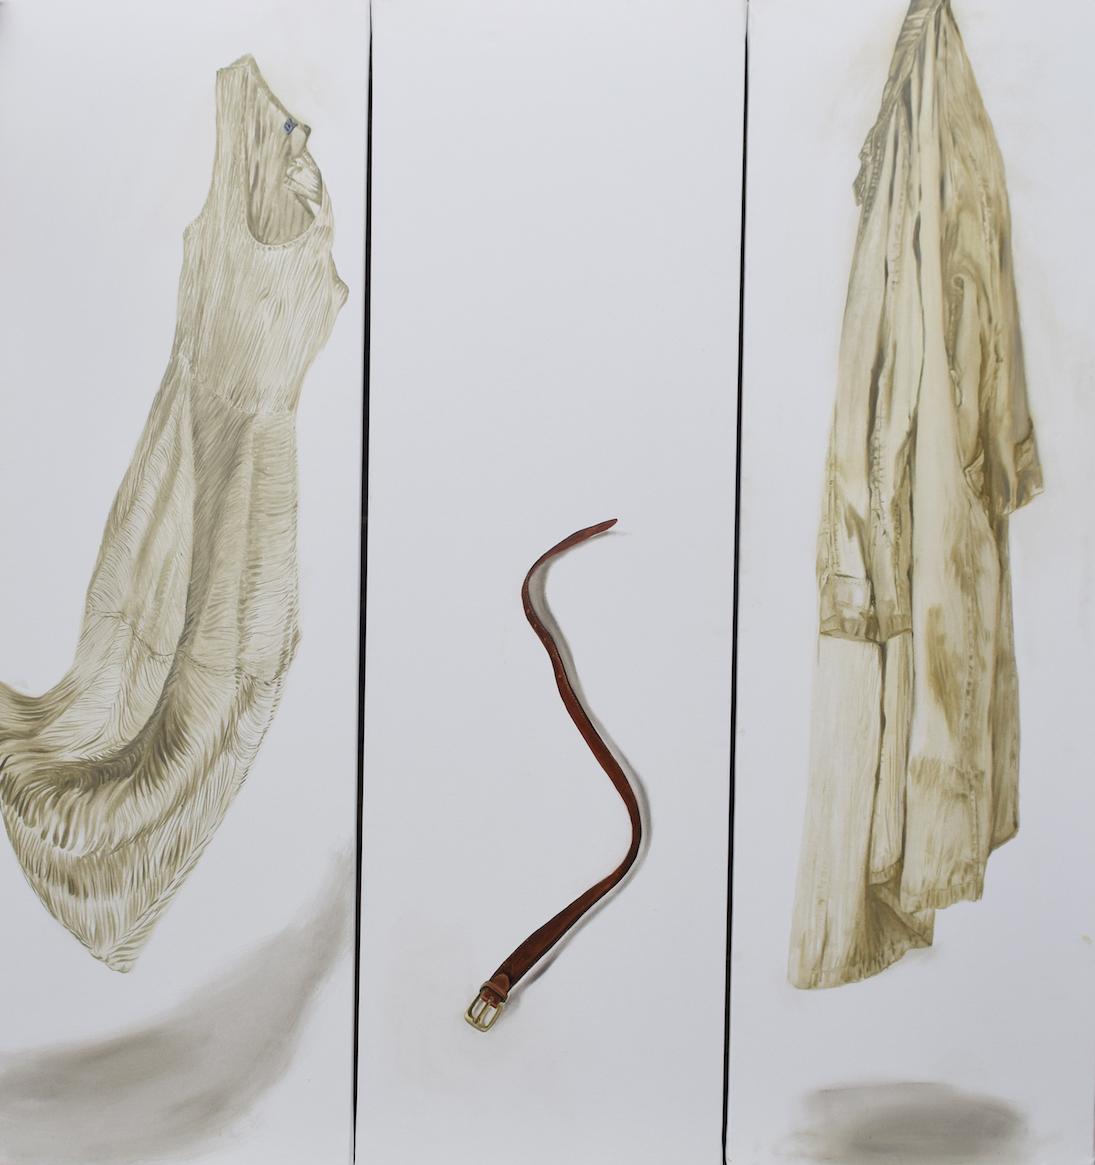 Paravento, 2017, olio su tela, 160x150